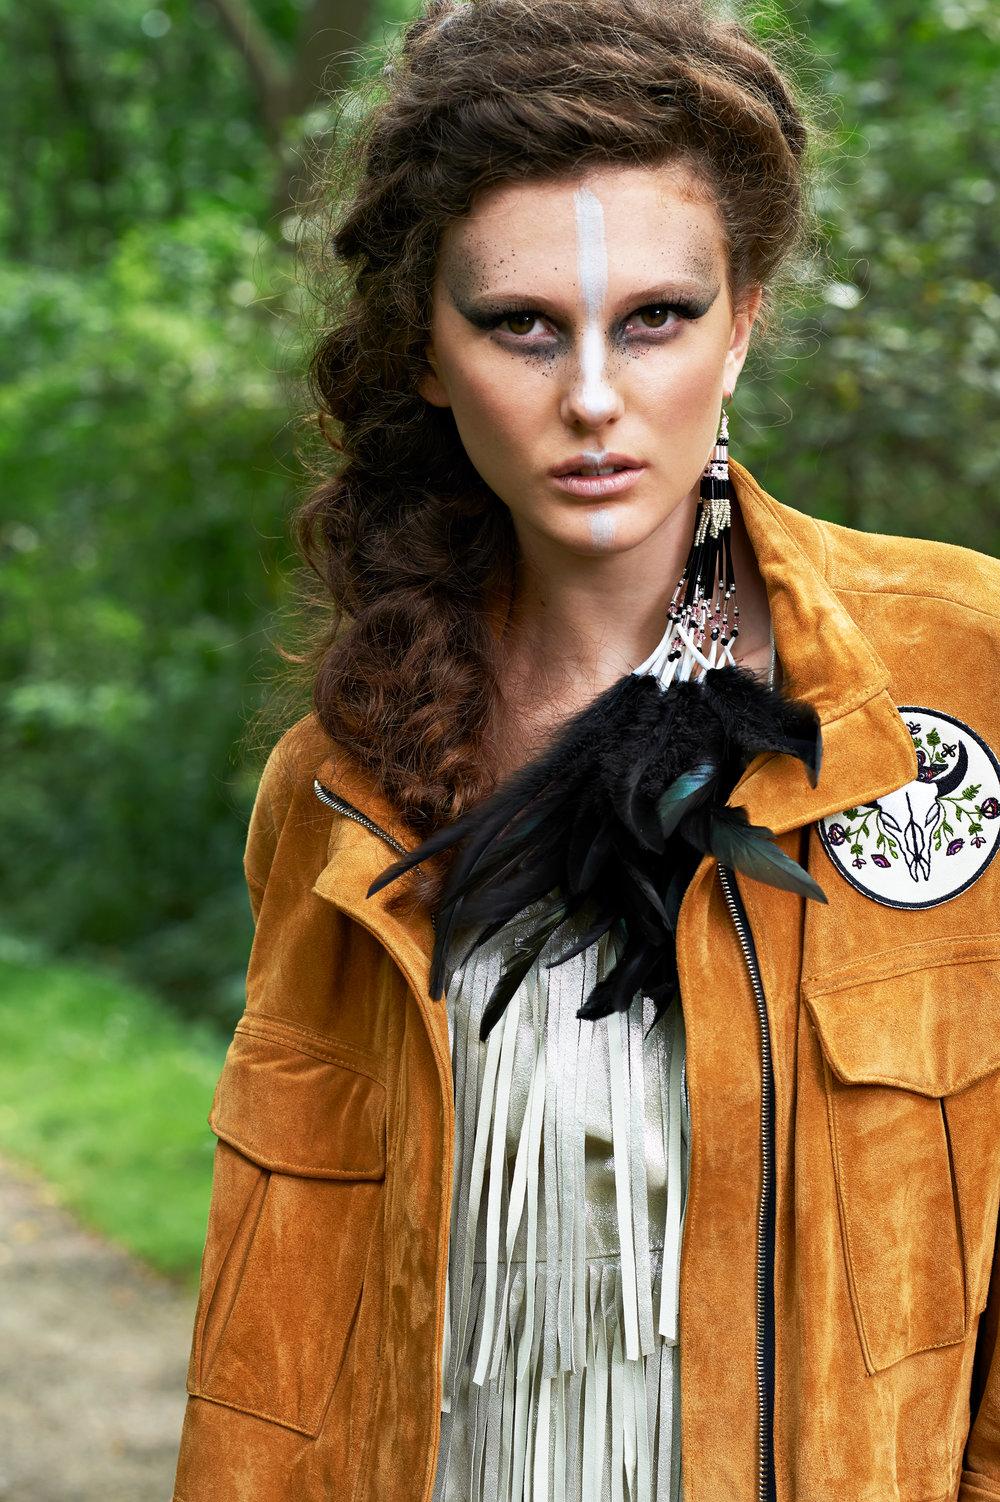 Marta-Hewson-Hamilton-Magazine-Fall-Designers-34874.jpg